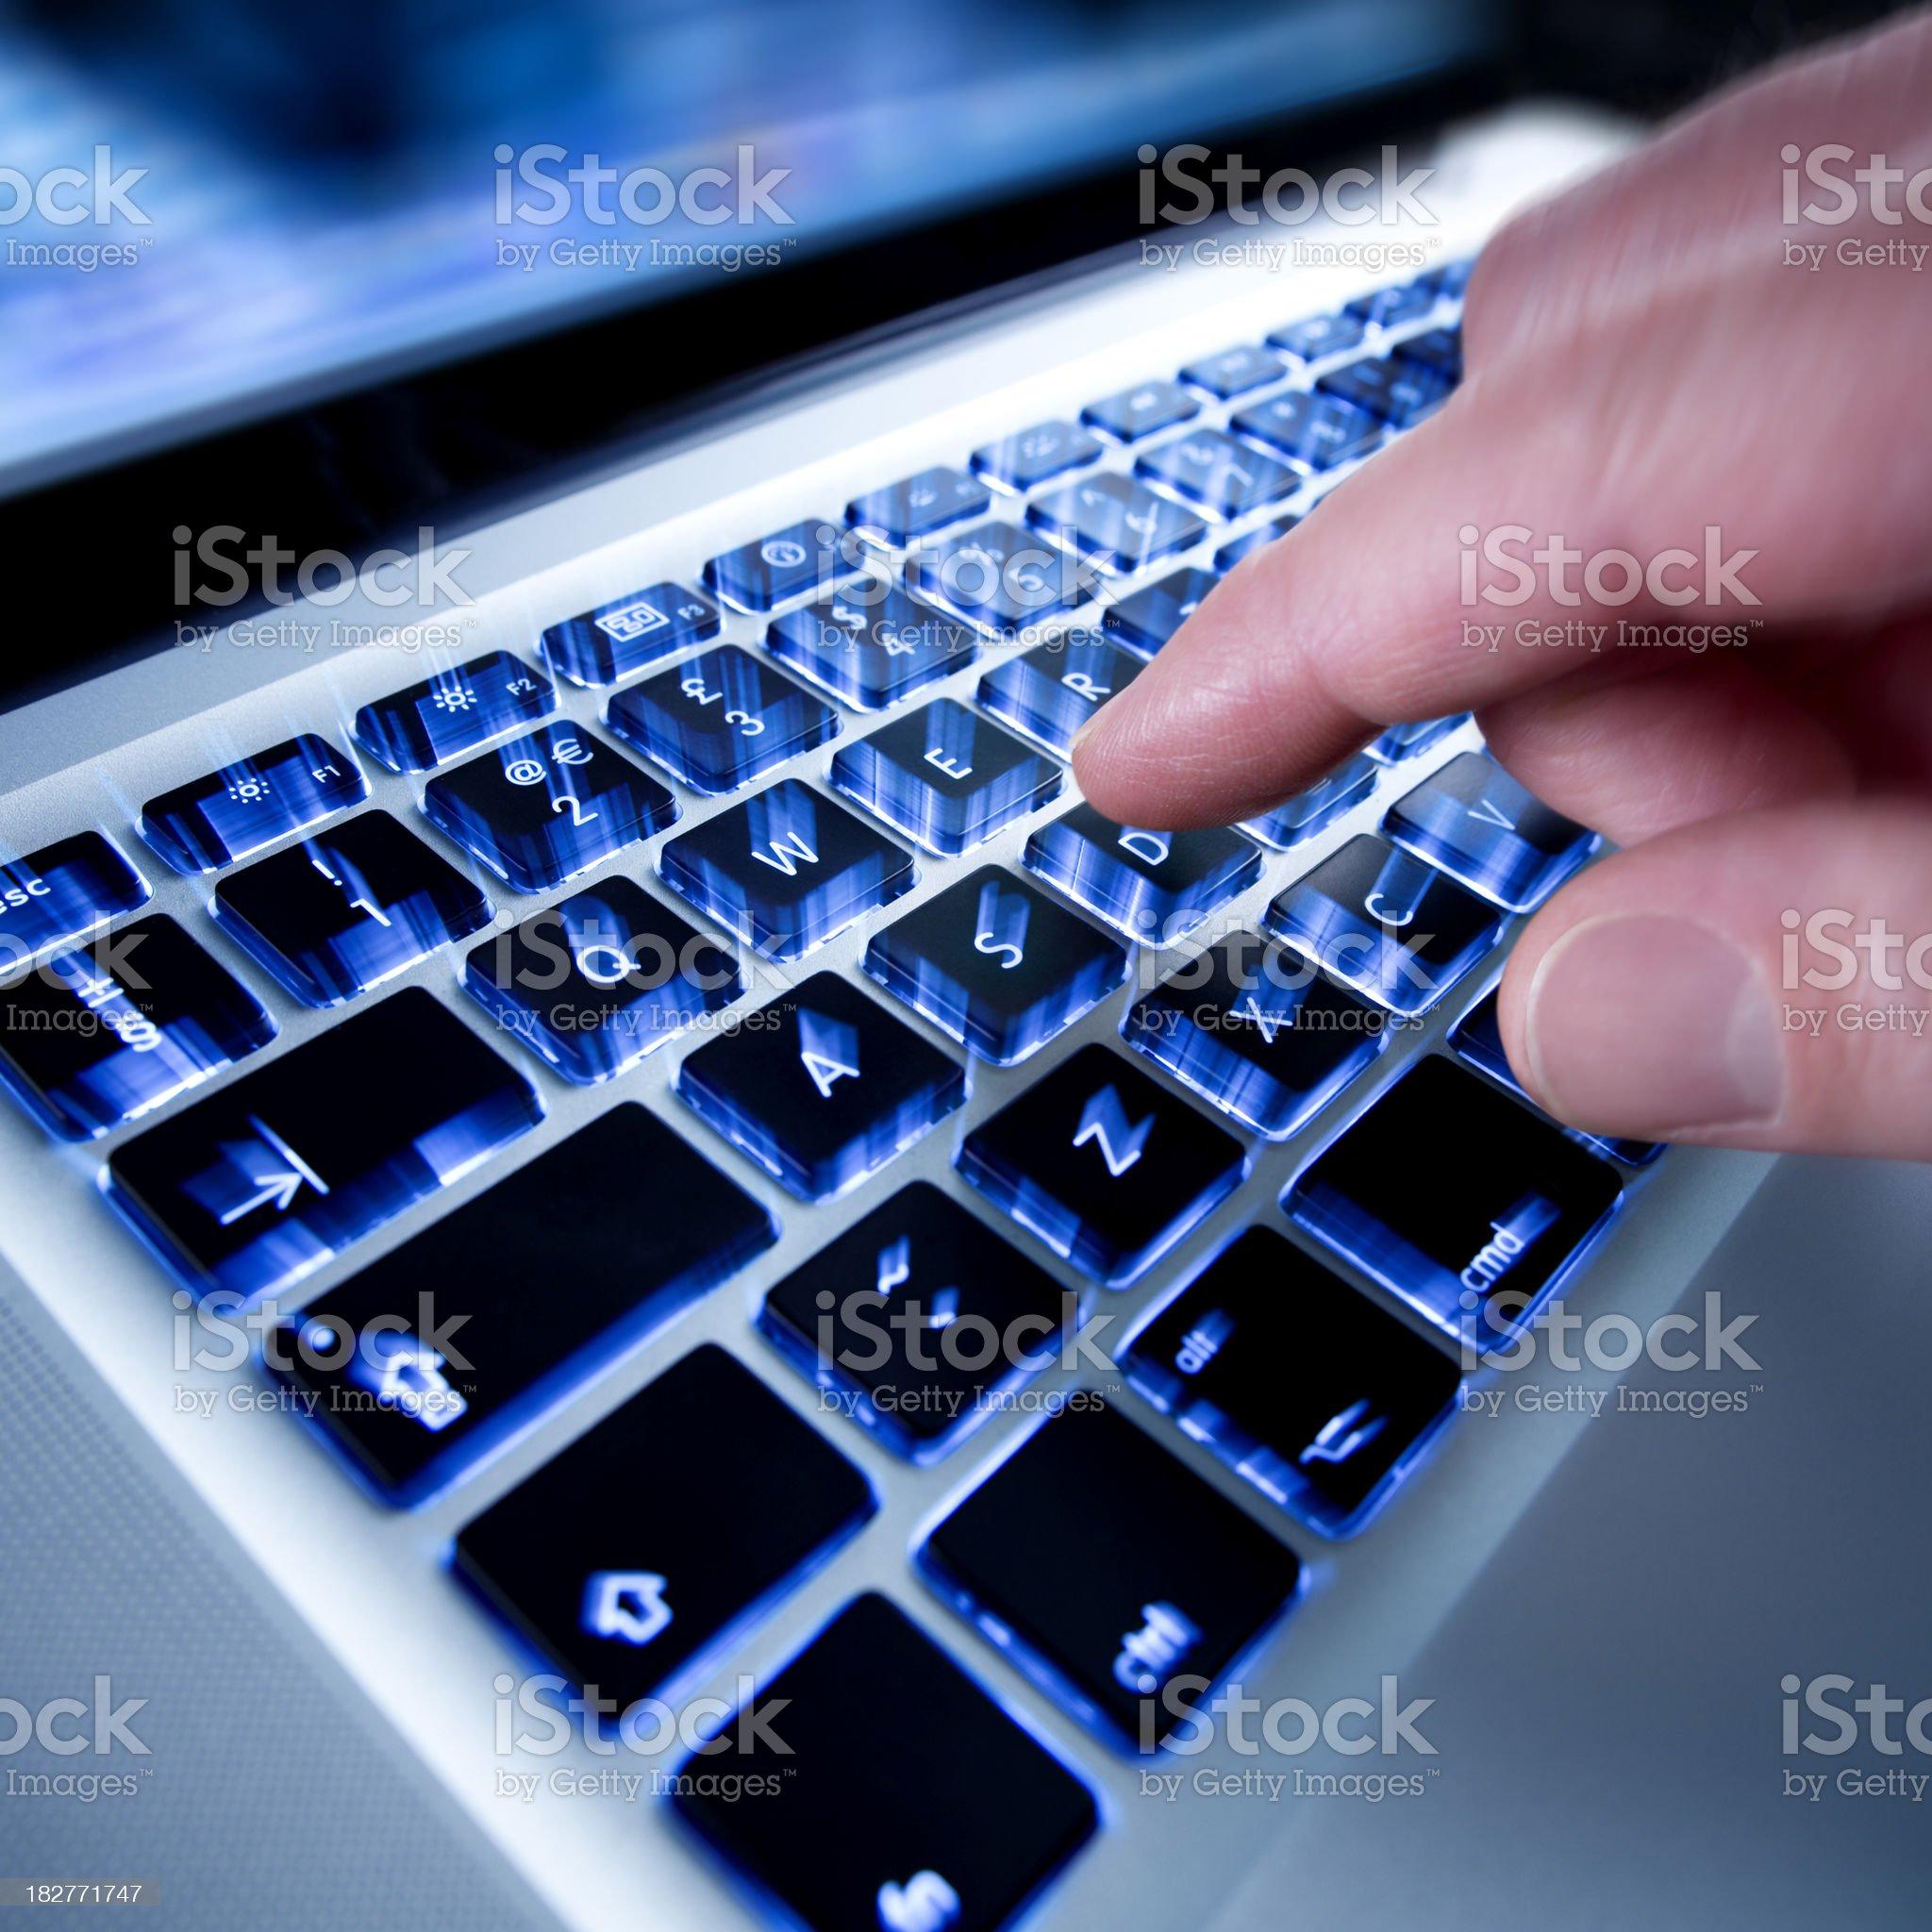 Illuminated Keyboard royalty-free stock photo